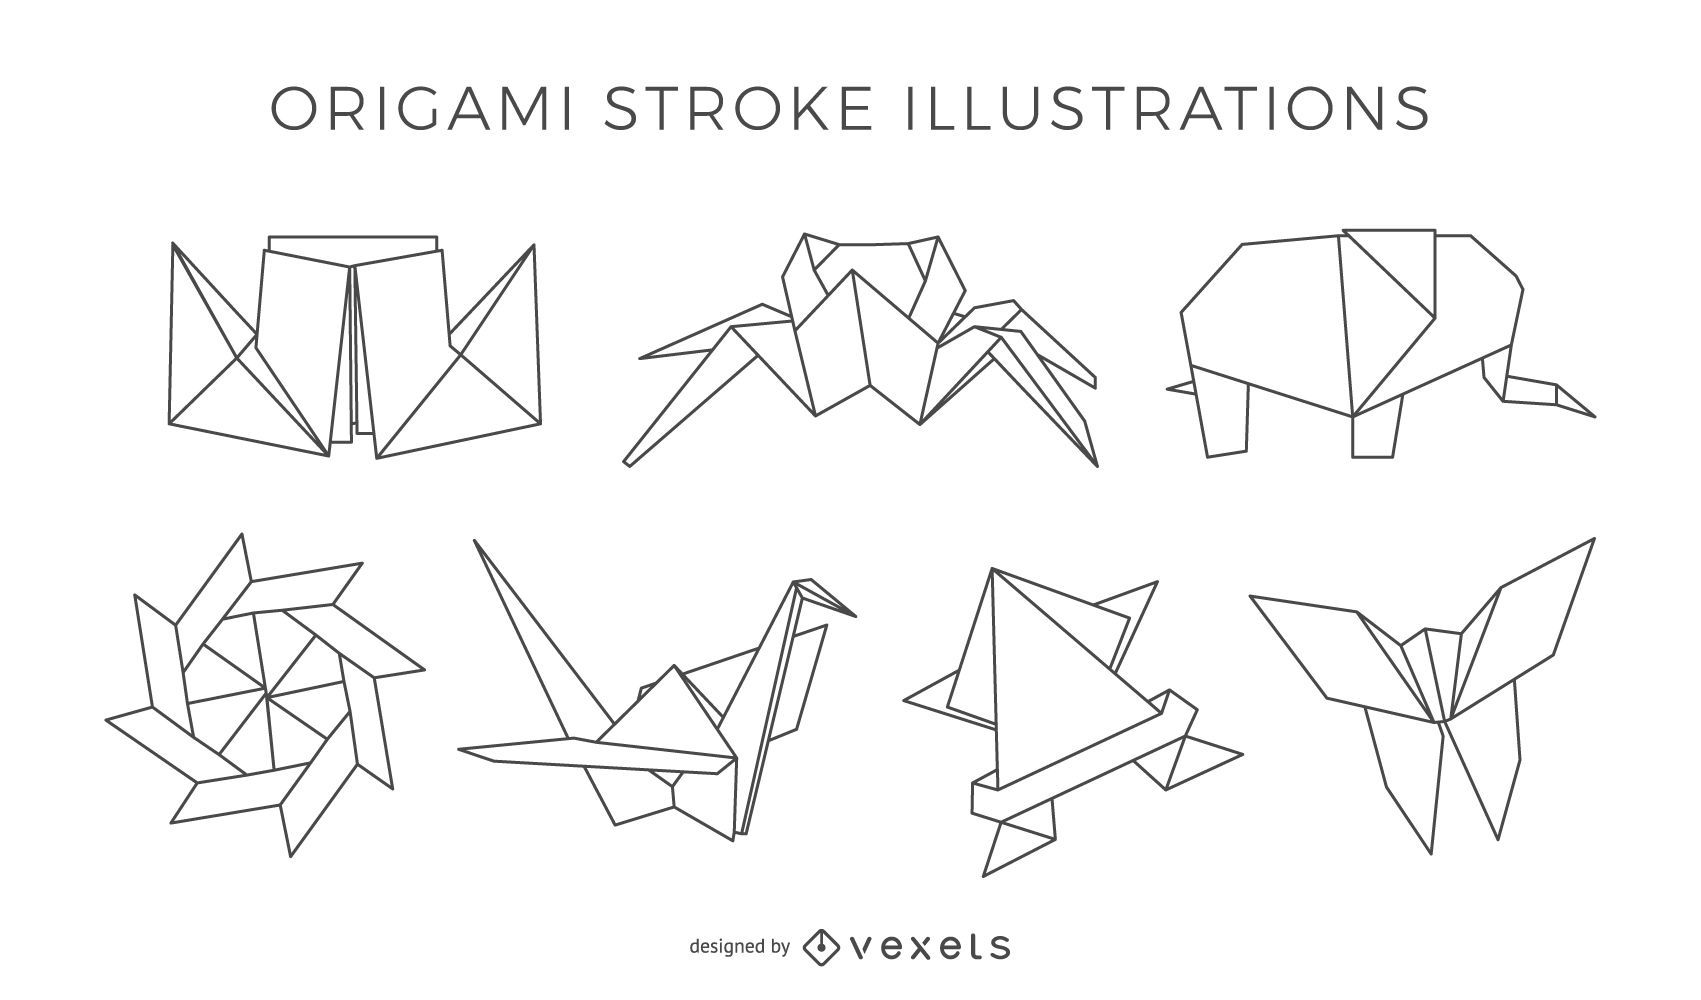 Stroke origami illustrations